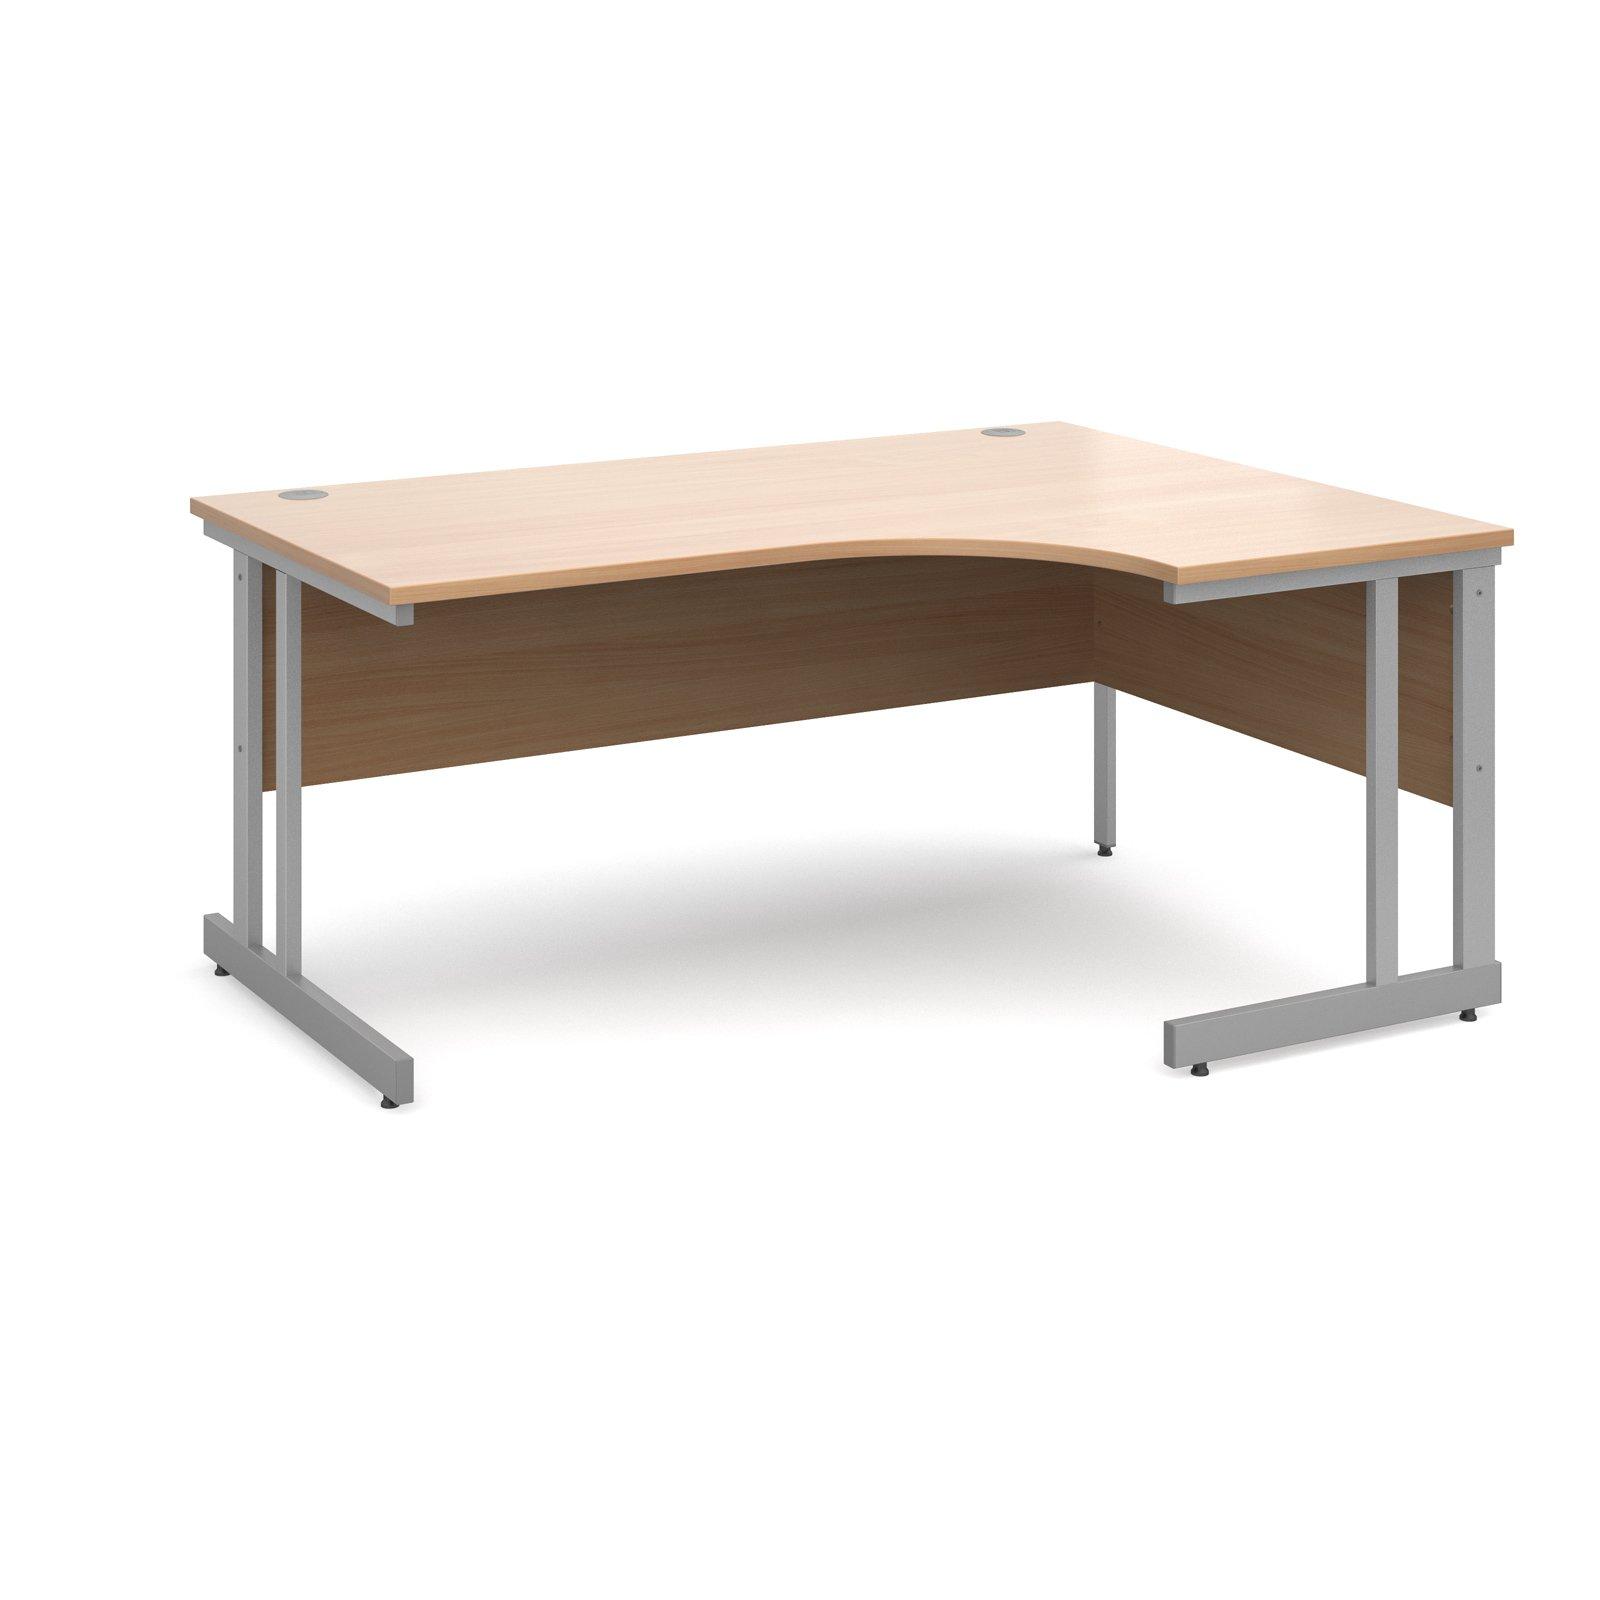 Momento right hand ergonomic desk 1600mm - silver cantilever frame, beech top